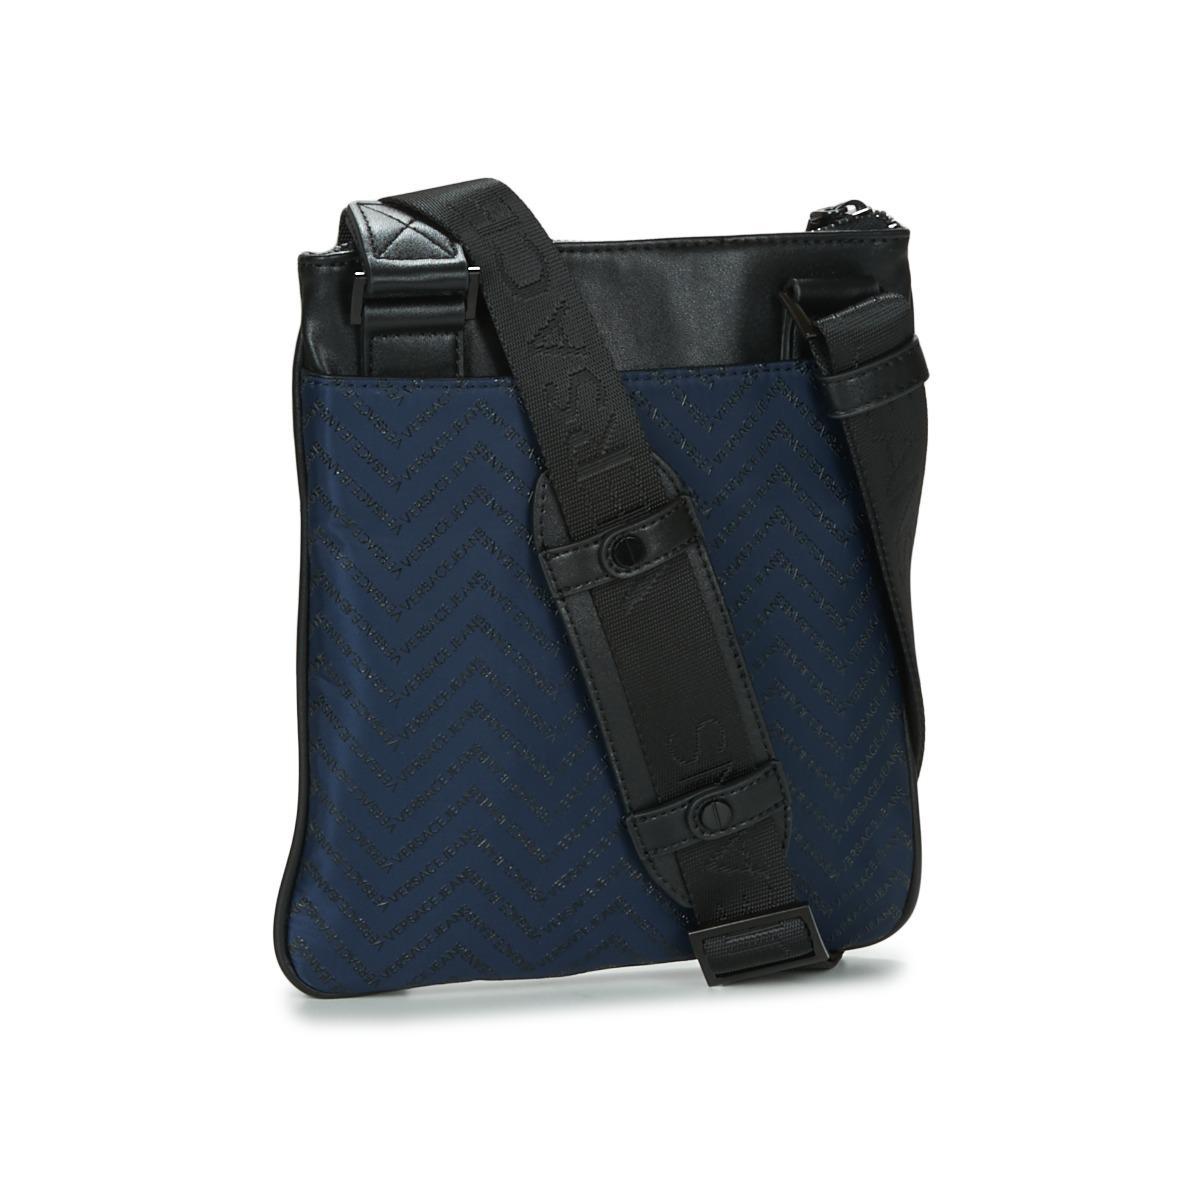 Versace Jeans Yrbb08 Men s Pouch In Blue in Blue for Men - Lyst e5462b016e93f